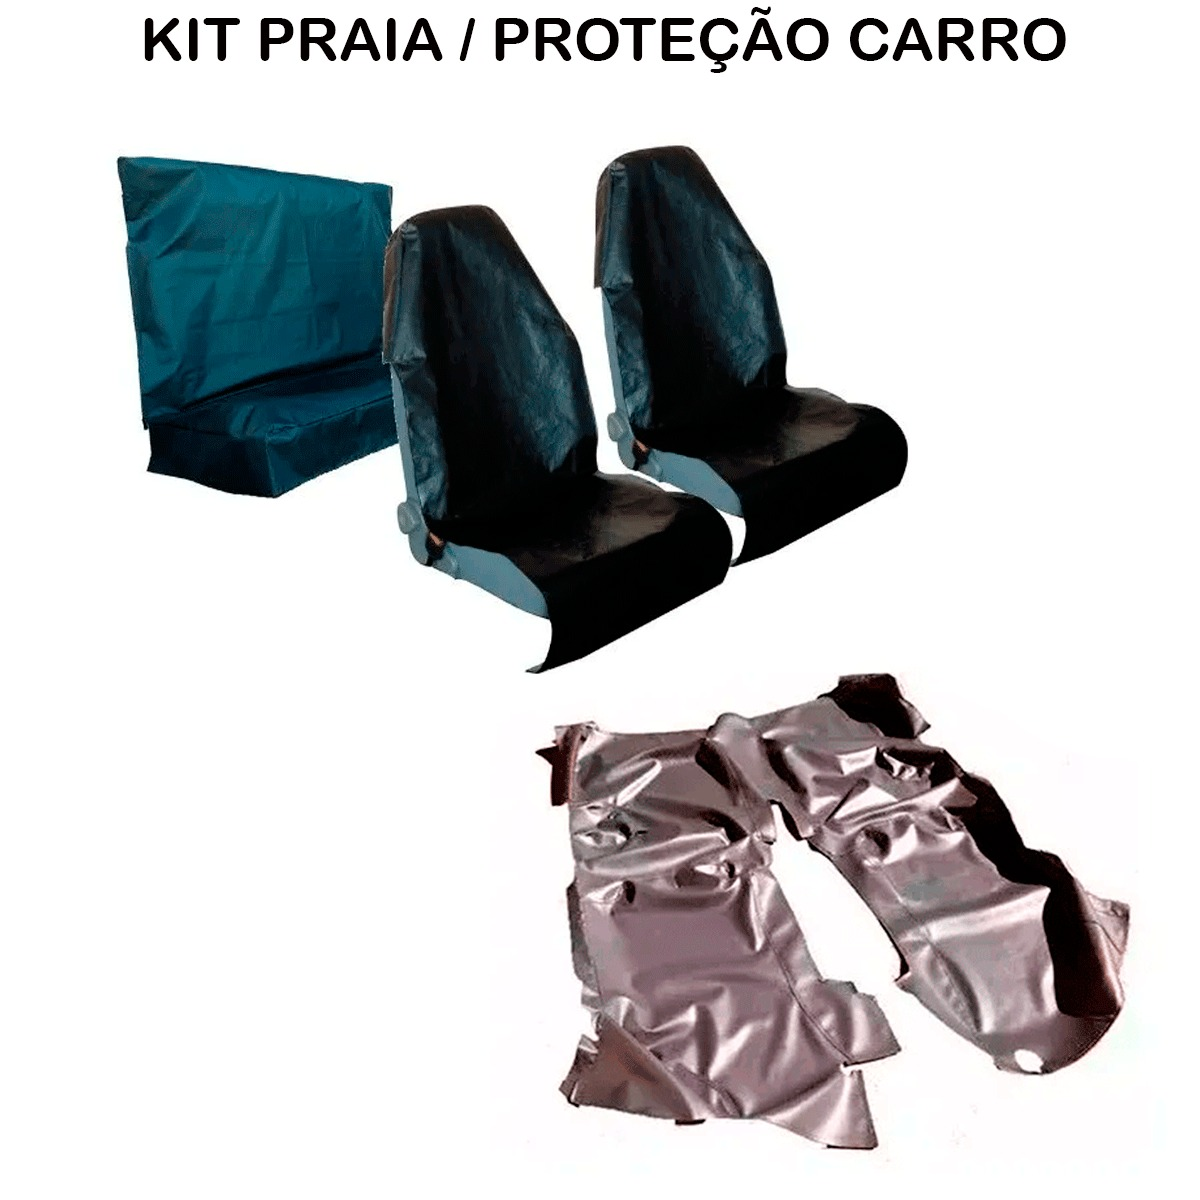 Tapete Em Vinil Ford Ranger Dupla 2012 a 2020 + Capa Banco Protecao Banco Areia Suor Academia